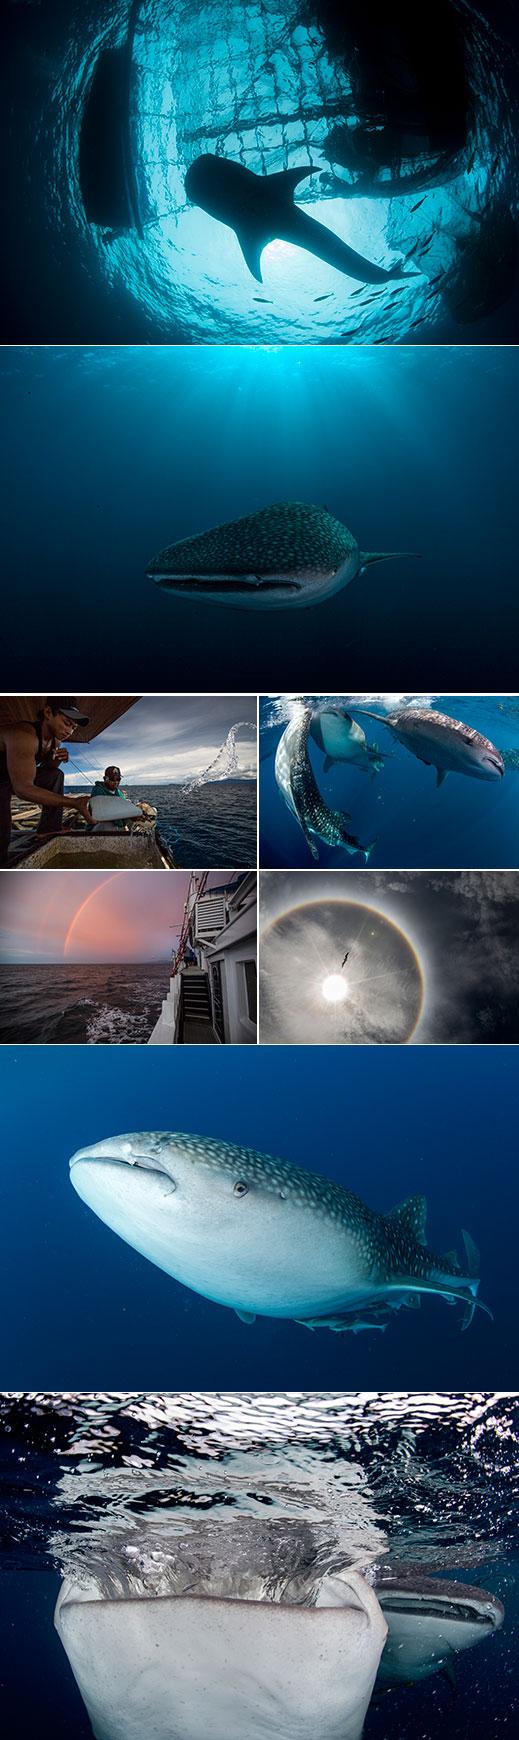 whale sharks Cendrawasih Bay